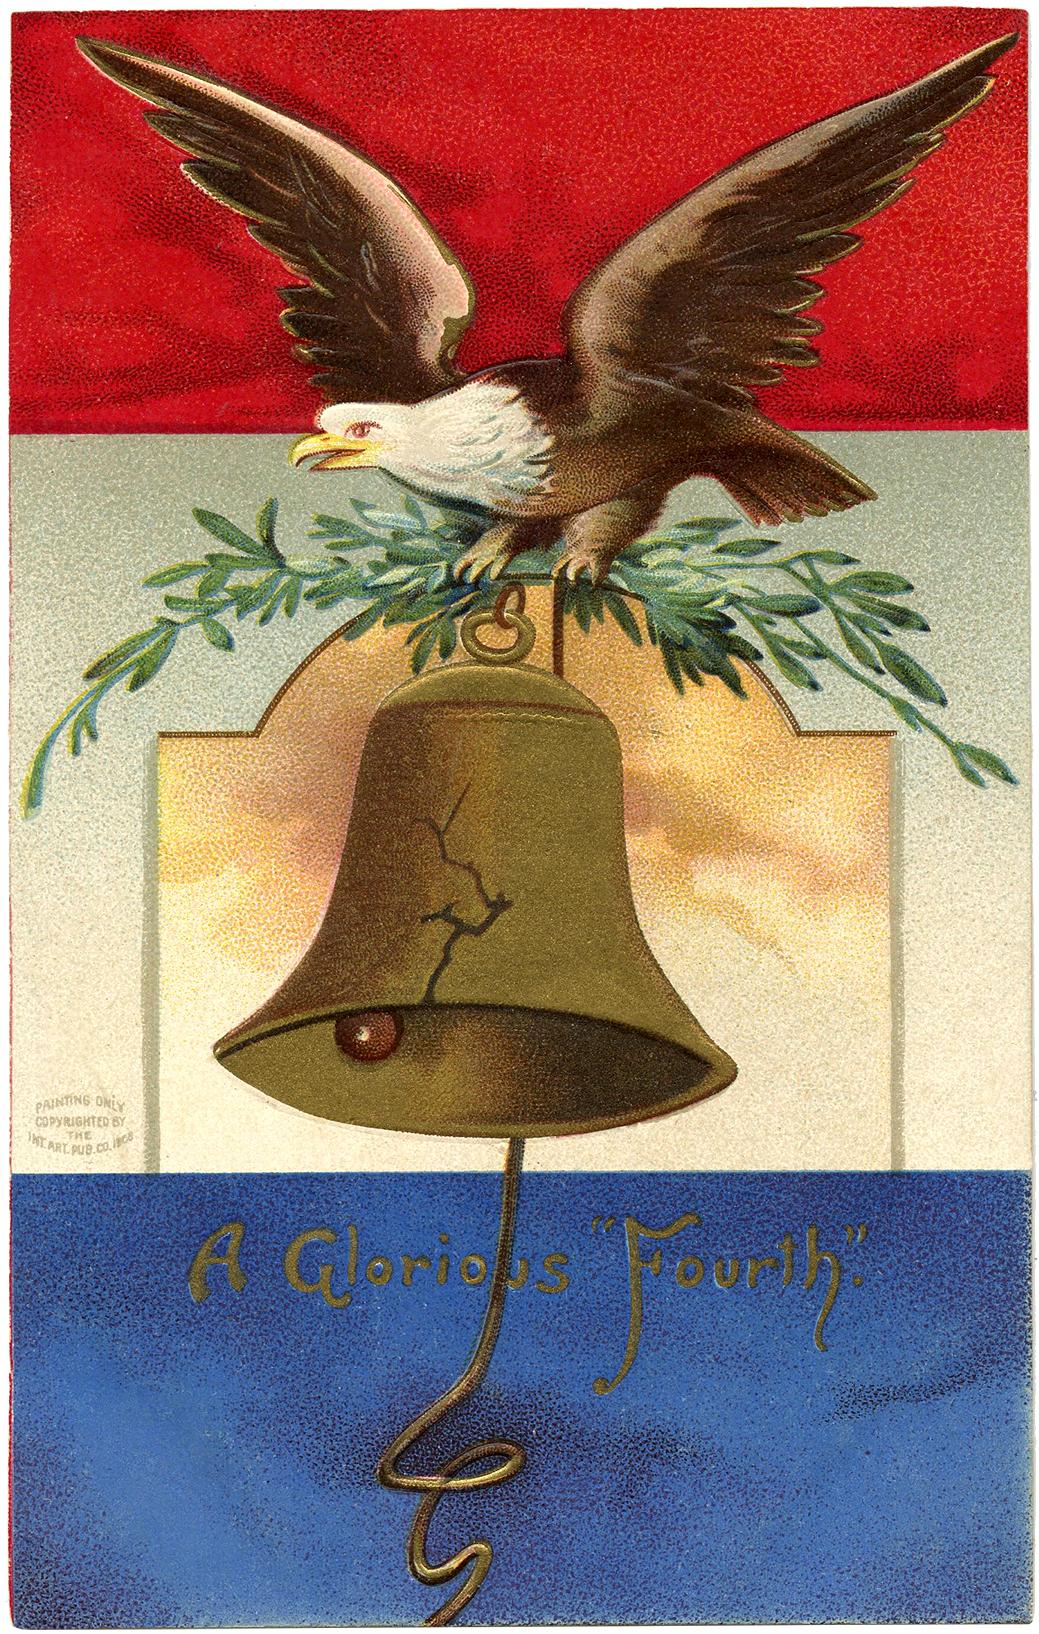 The Graphics Fairy: Vintage Patriotic Eagle Image